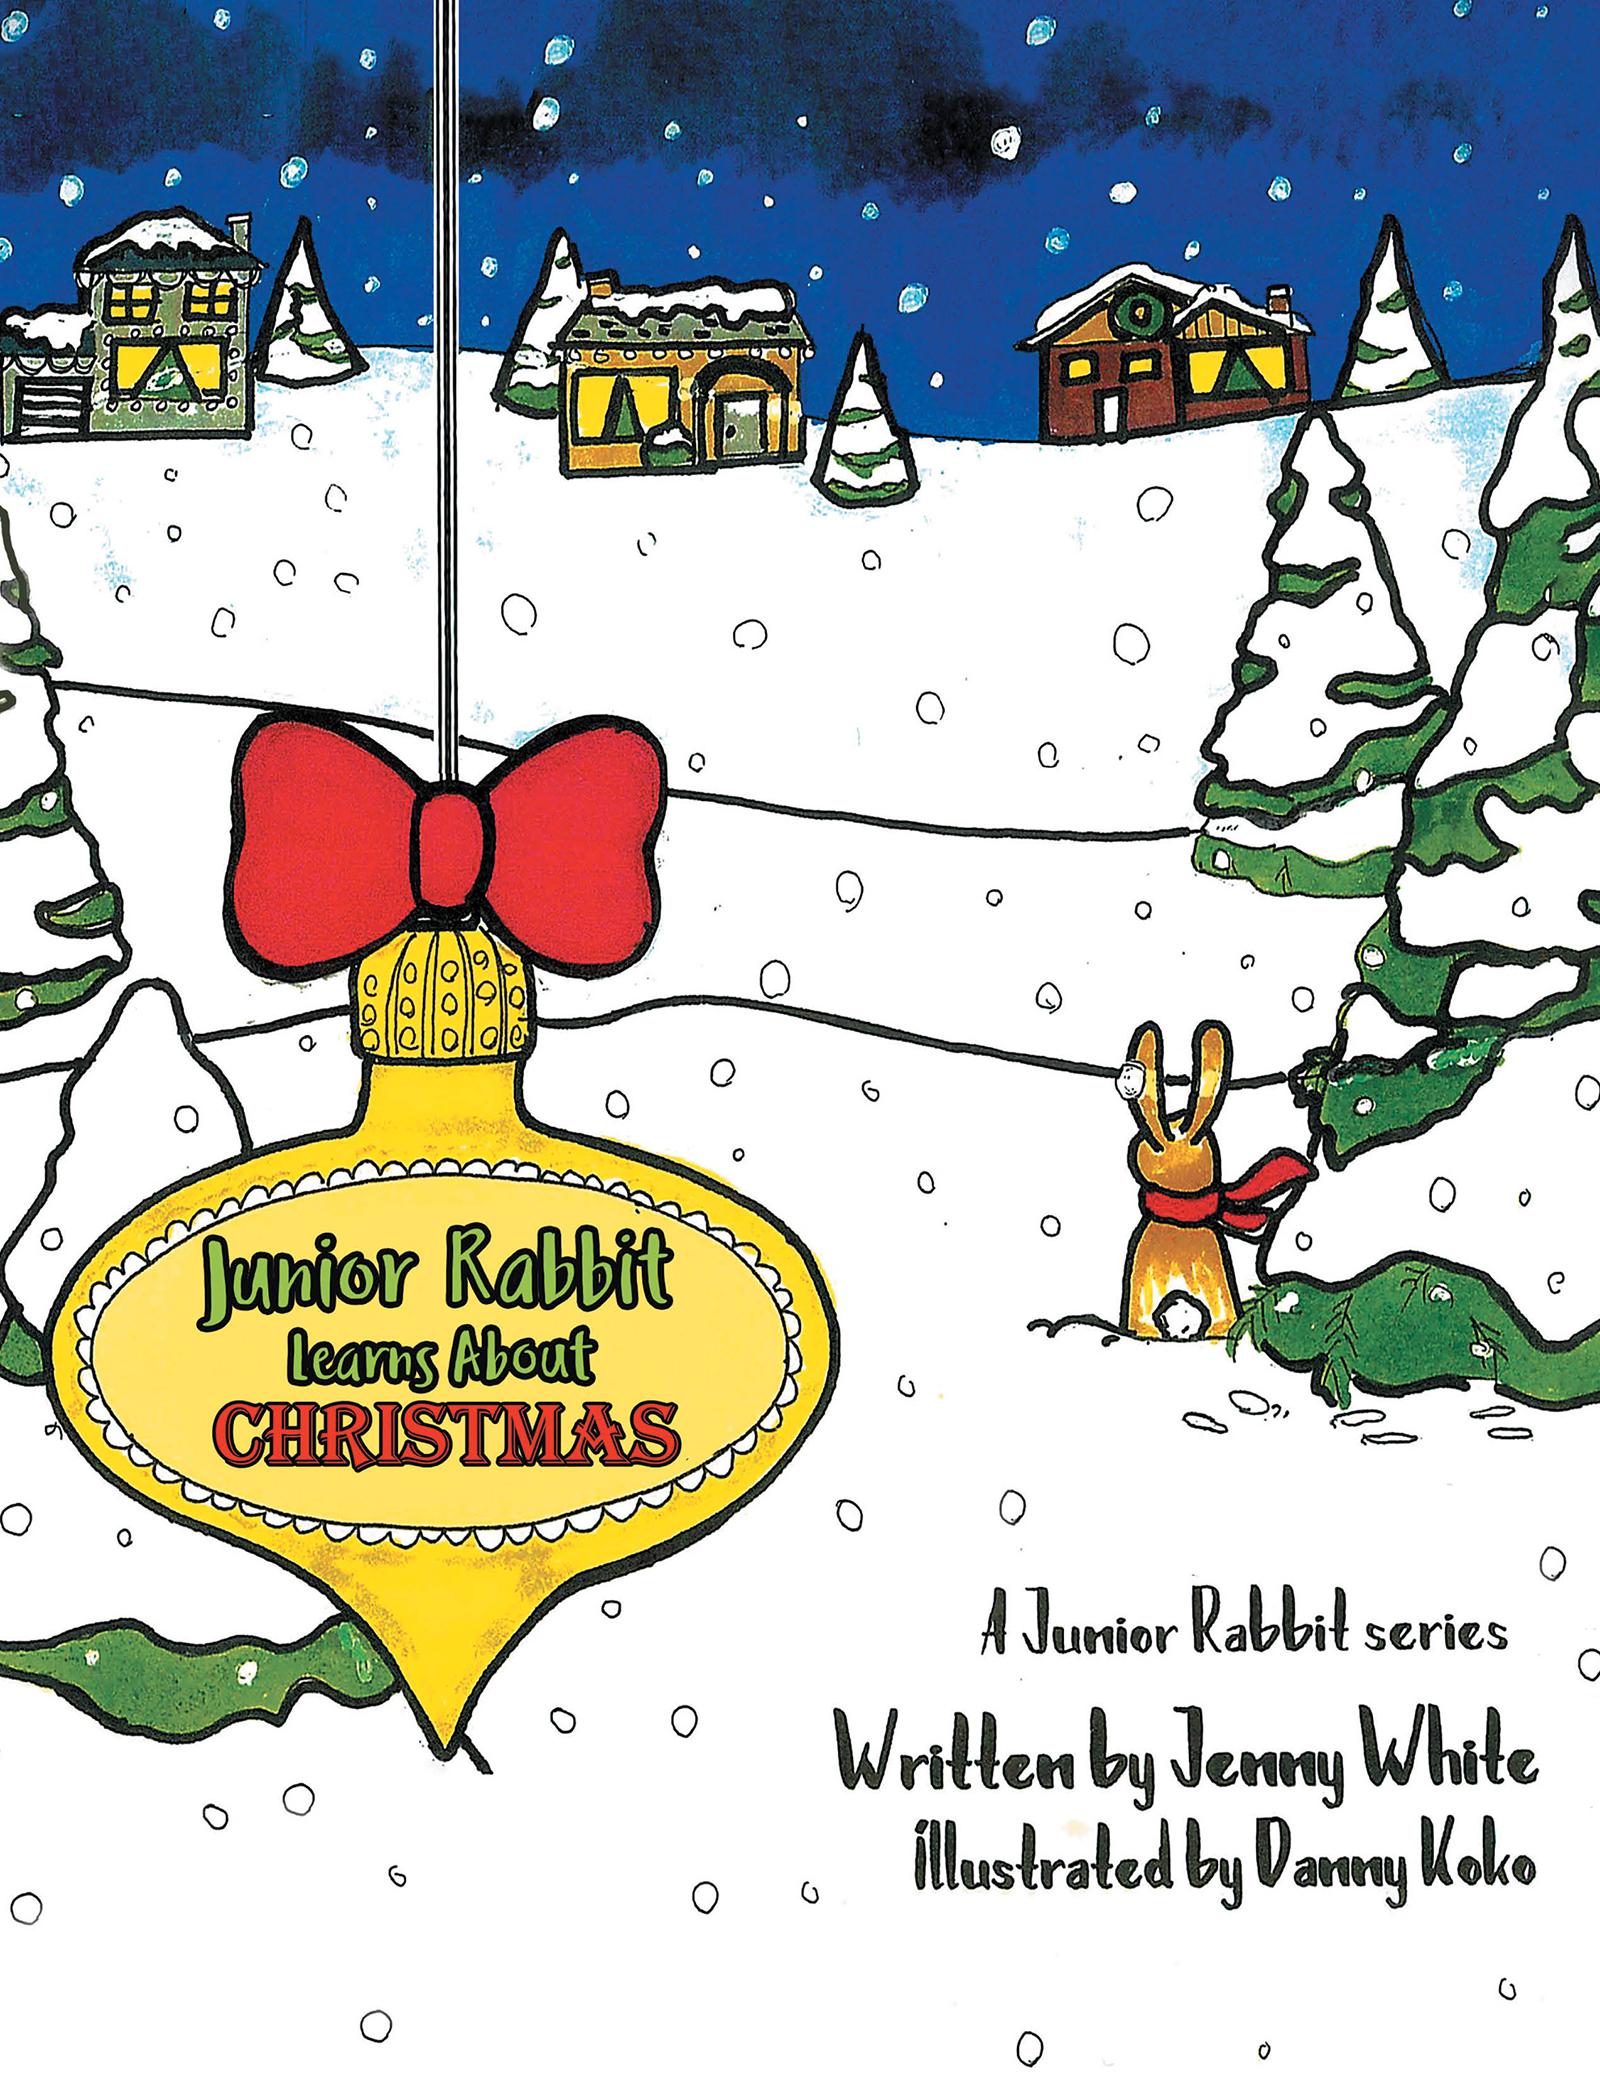 Junior Rabbit Adventures Hopping Its Way to Reader's Hearts